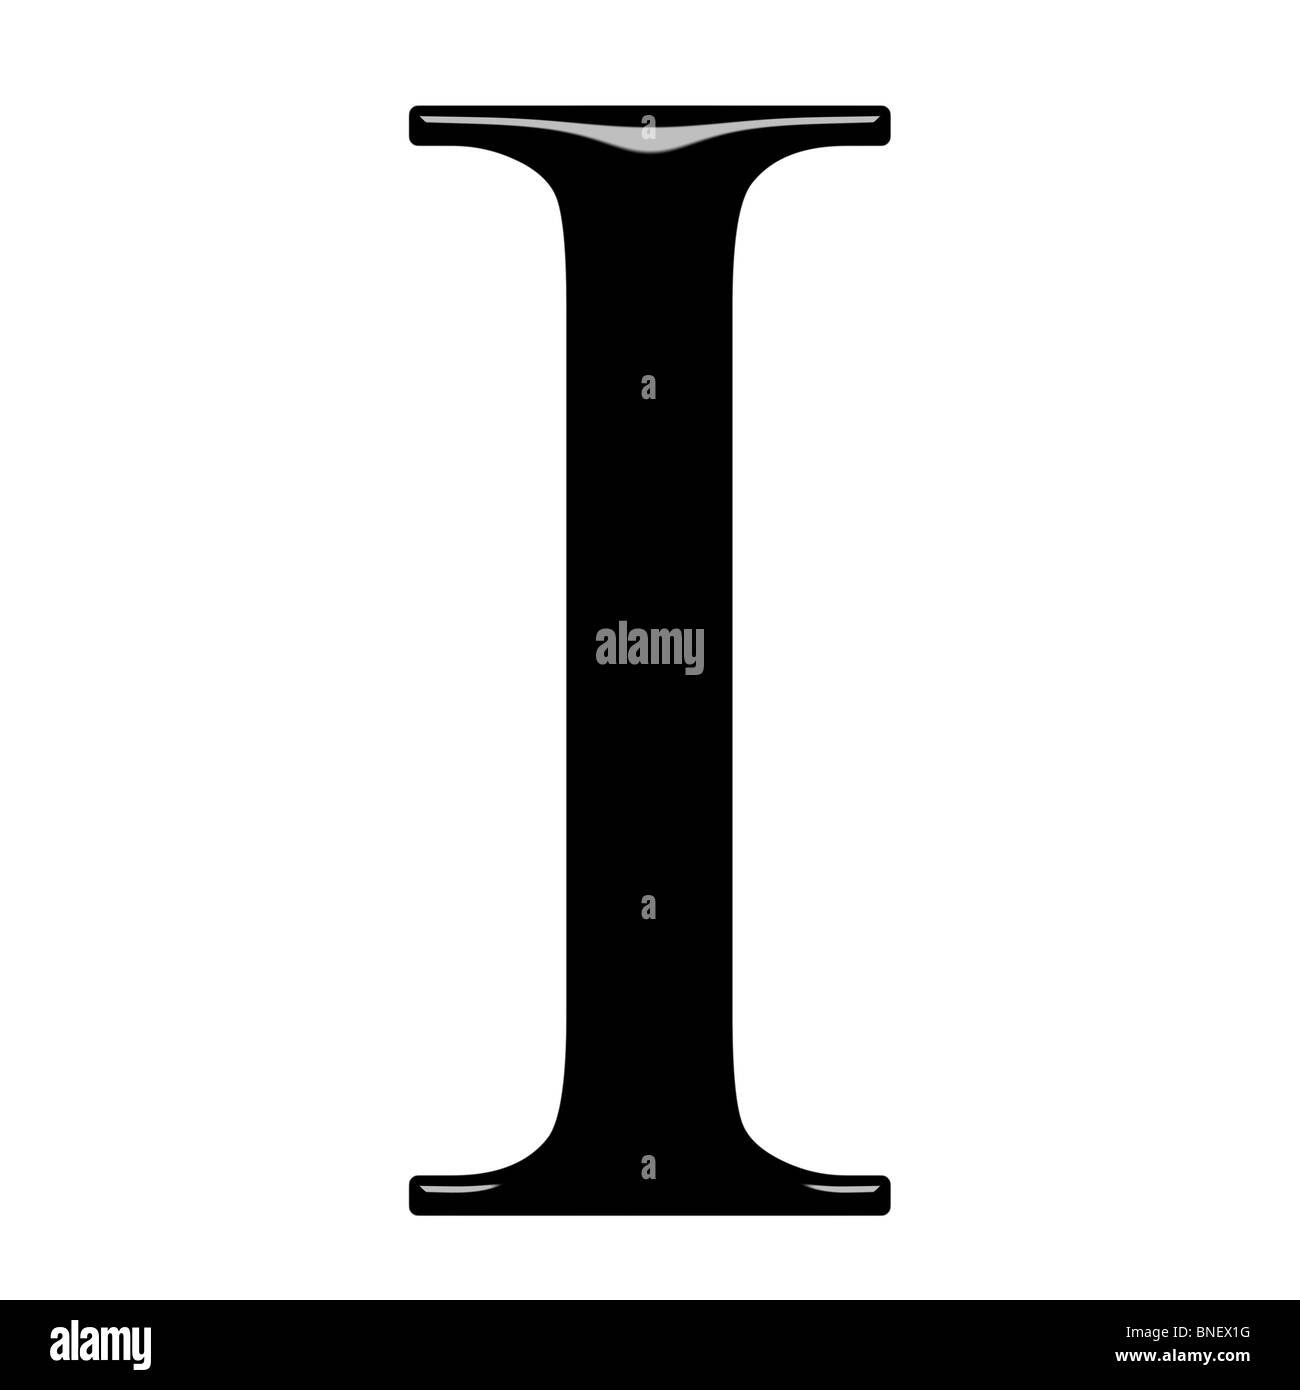 3d Greek letter Iota Stock Photo: 30445900   Alamy